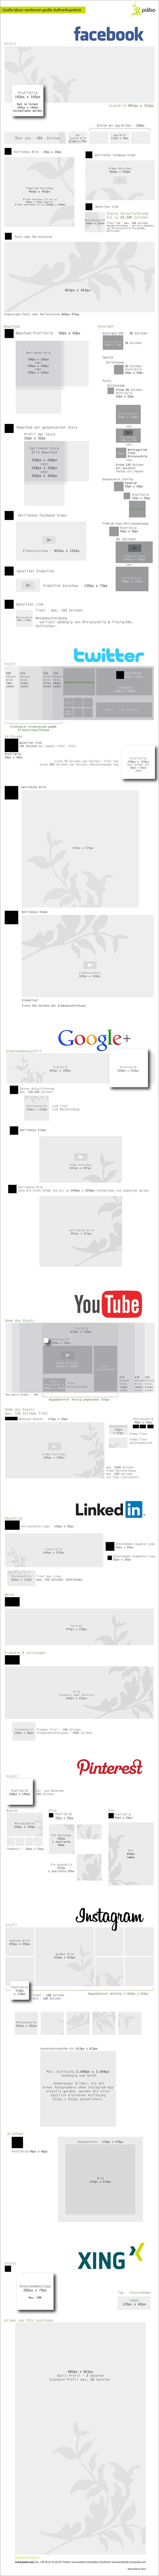 infografik-bildmasse-social-media-2014